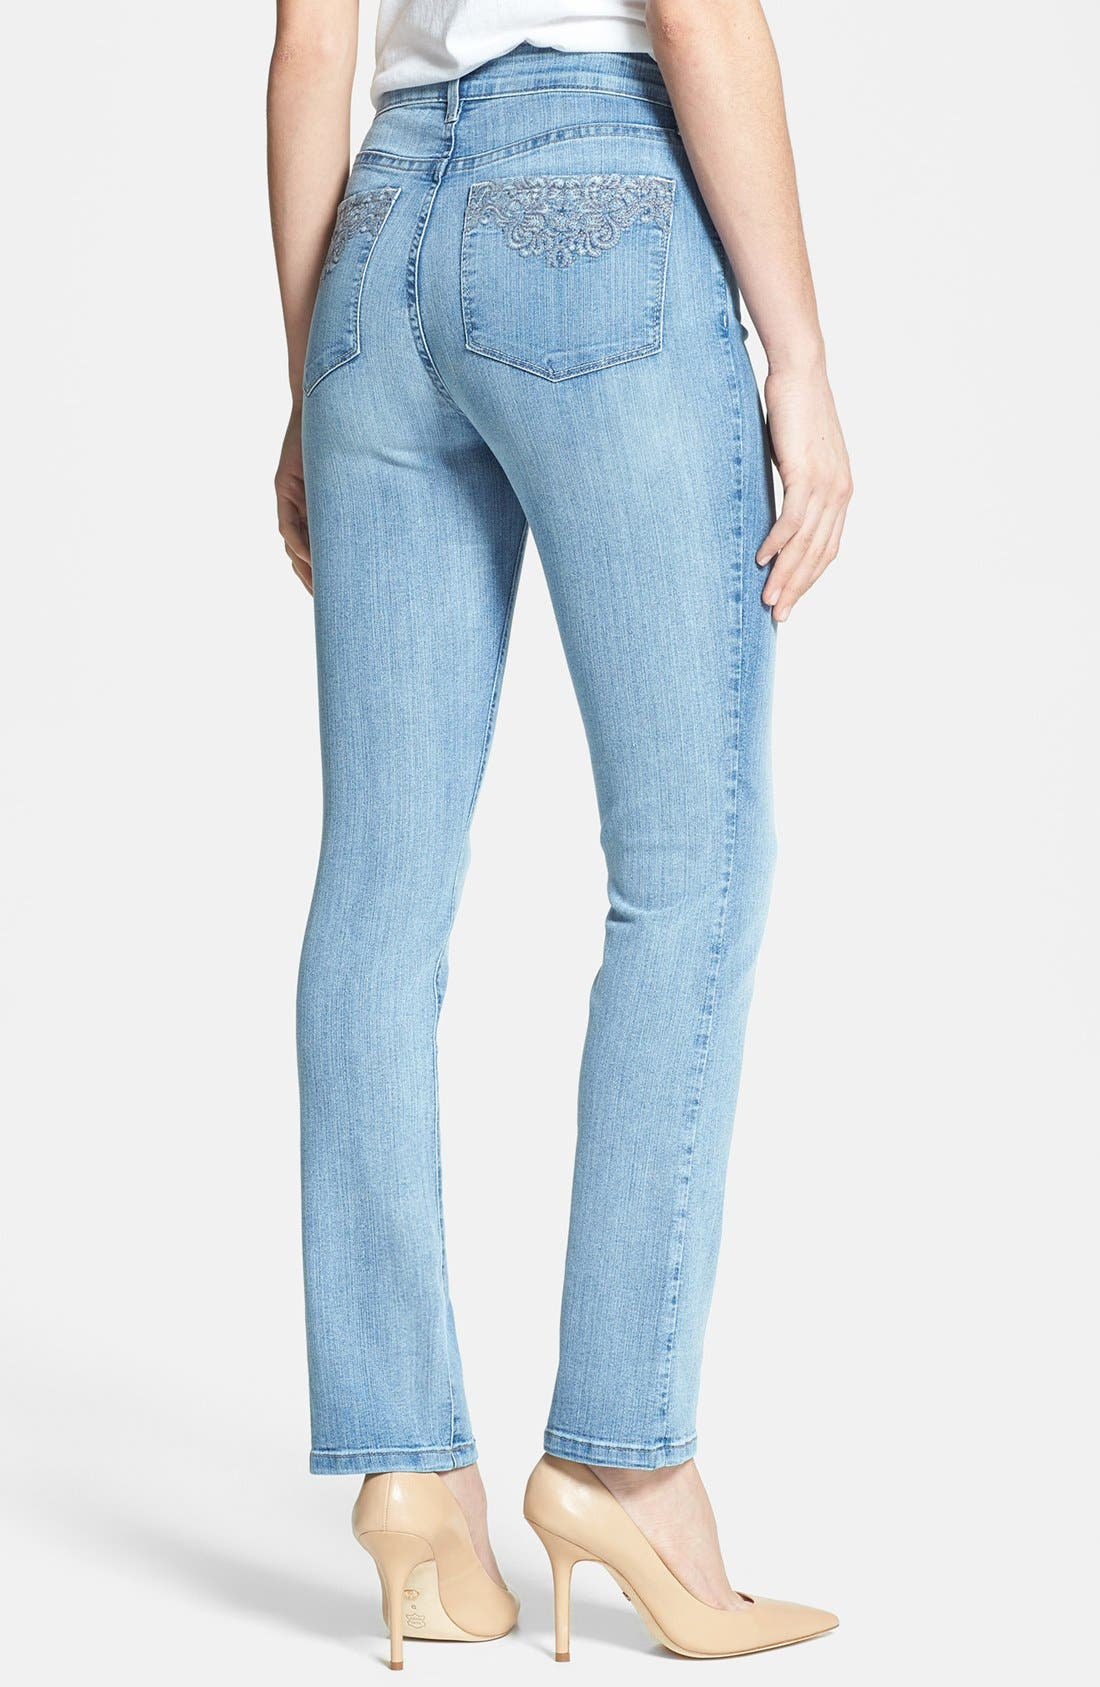 Alternate Image 2  - NYDJ 'Sheri' Stretch Skinny Jeans (Palos Verdes) (Regular & Petite)